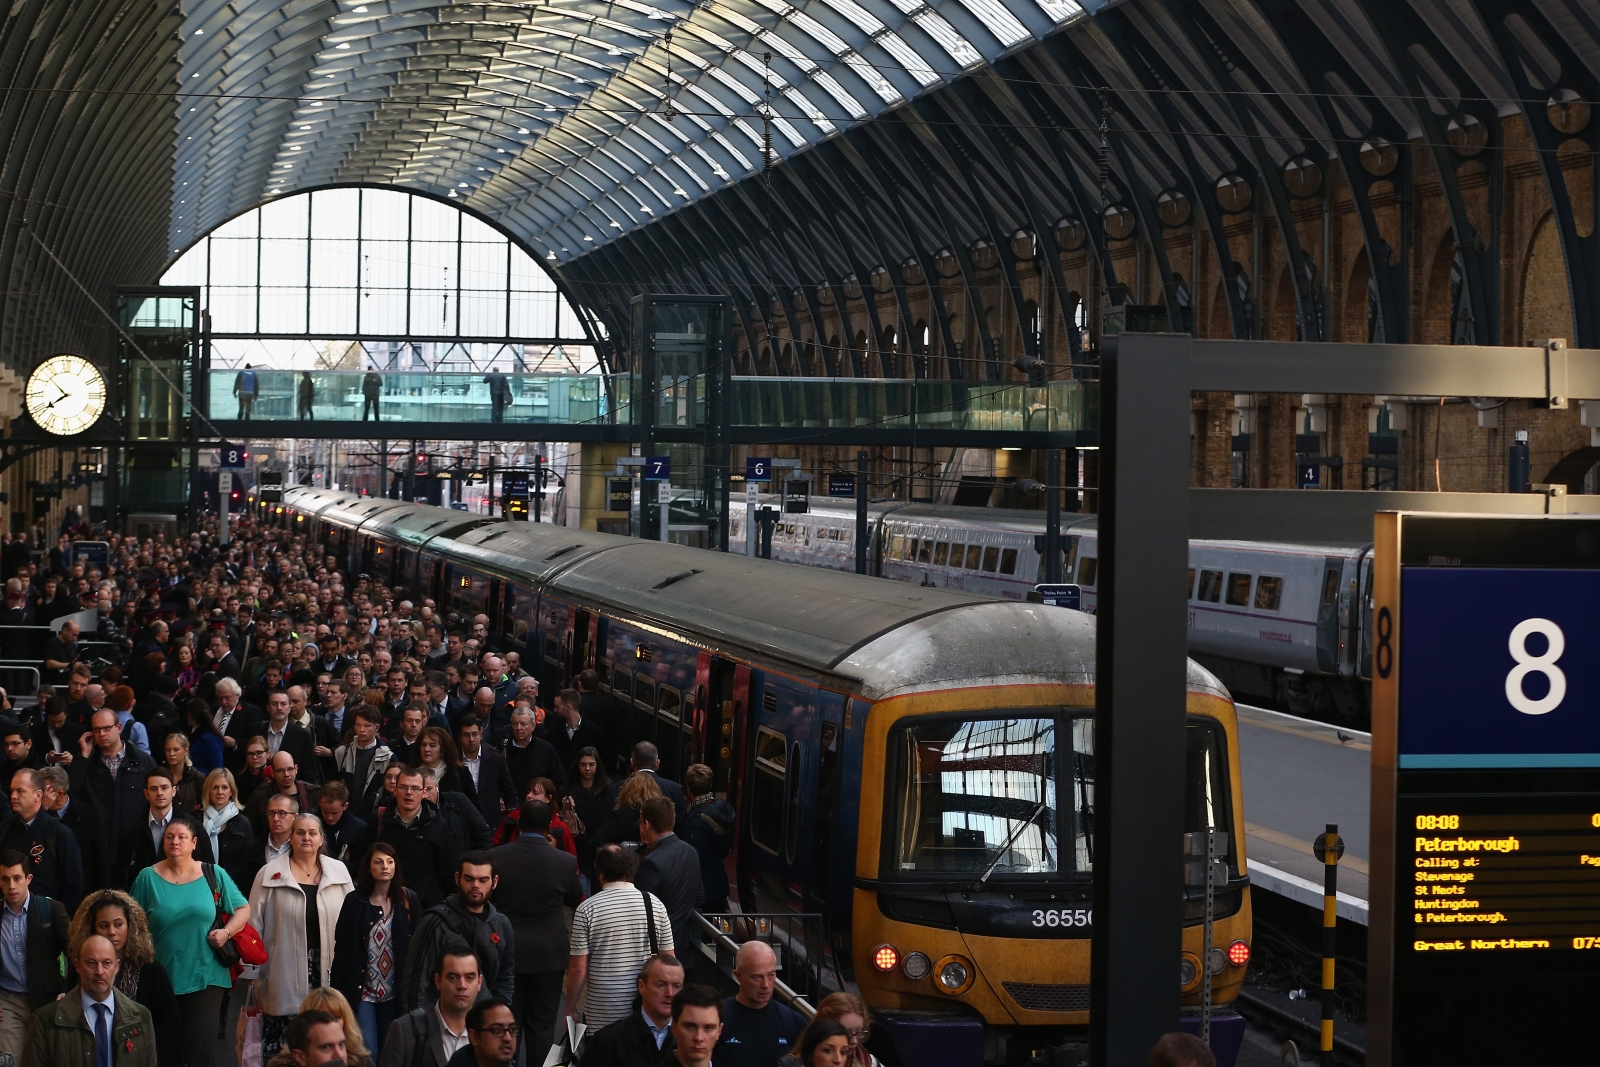 London transport crowds